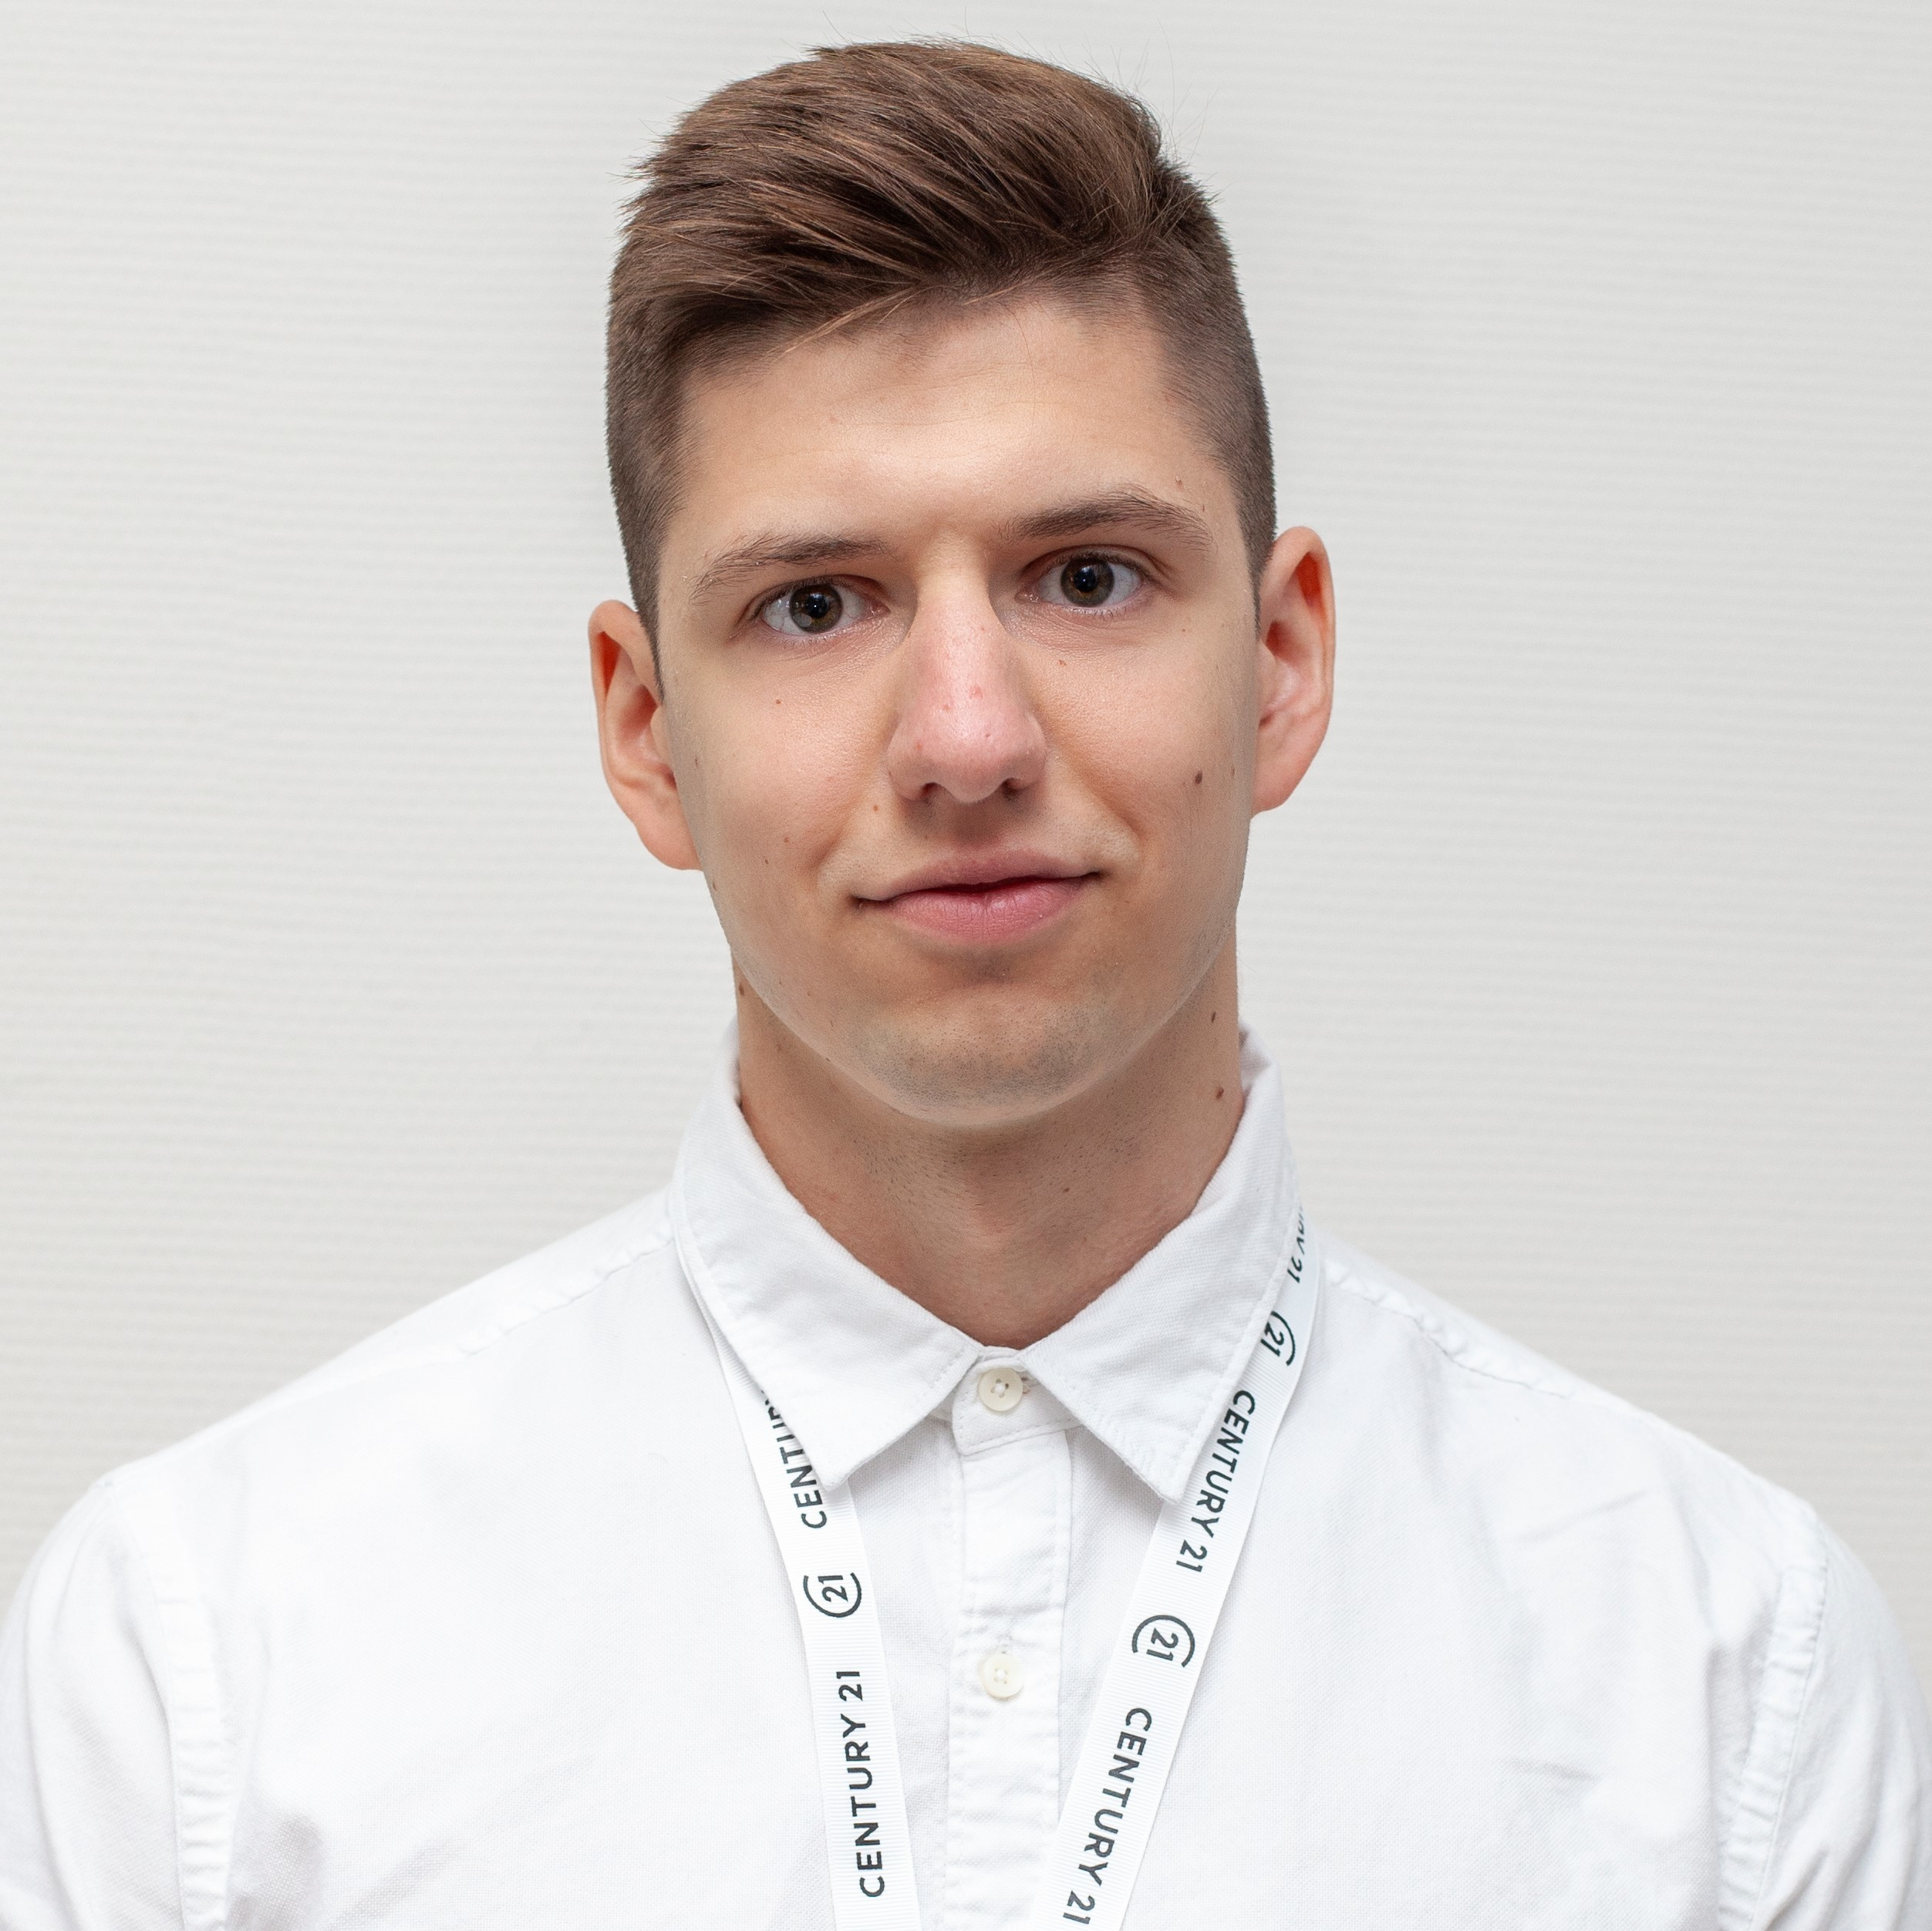 Андрюшин Савелий